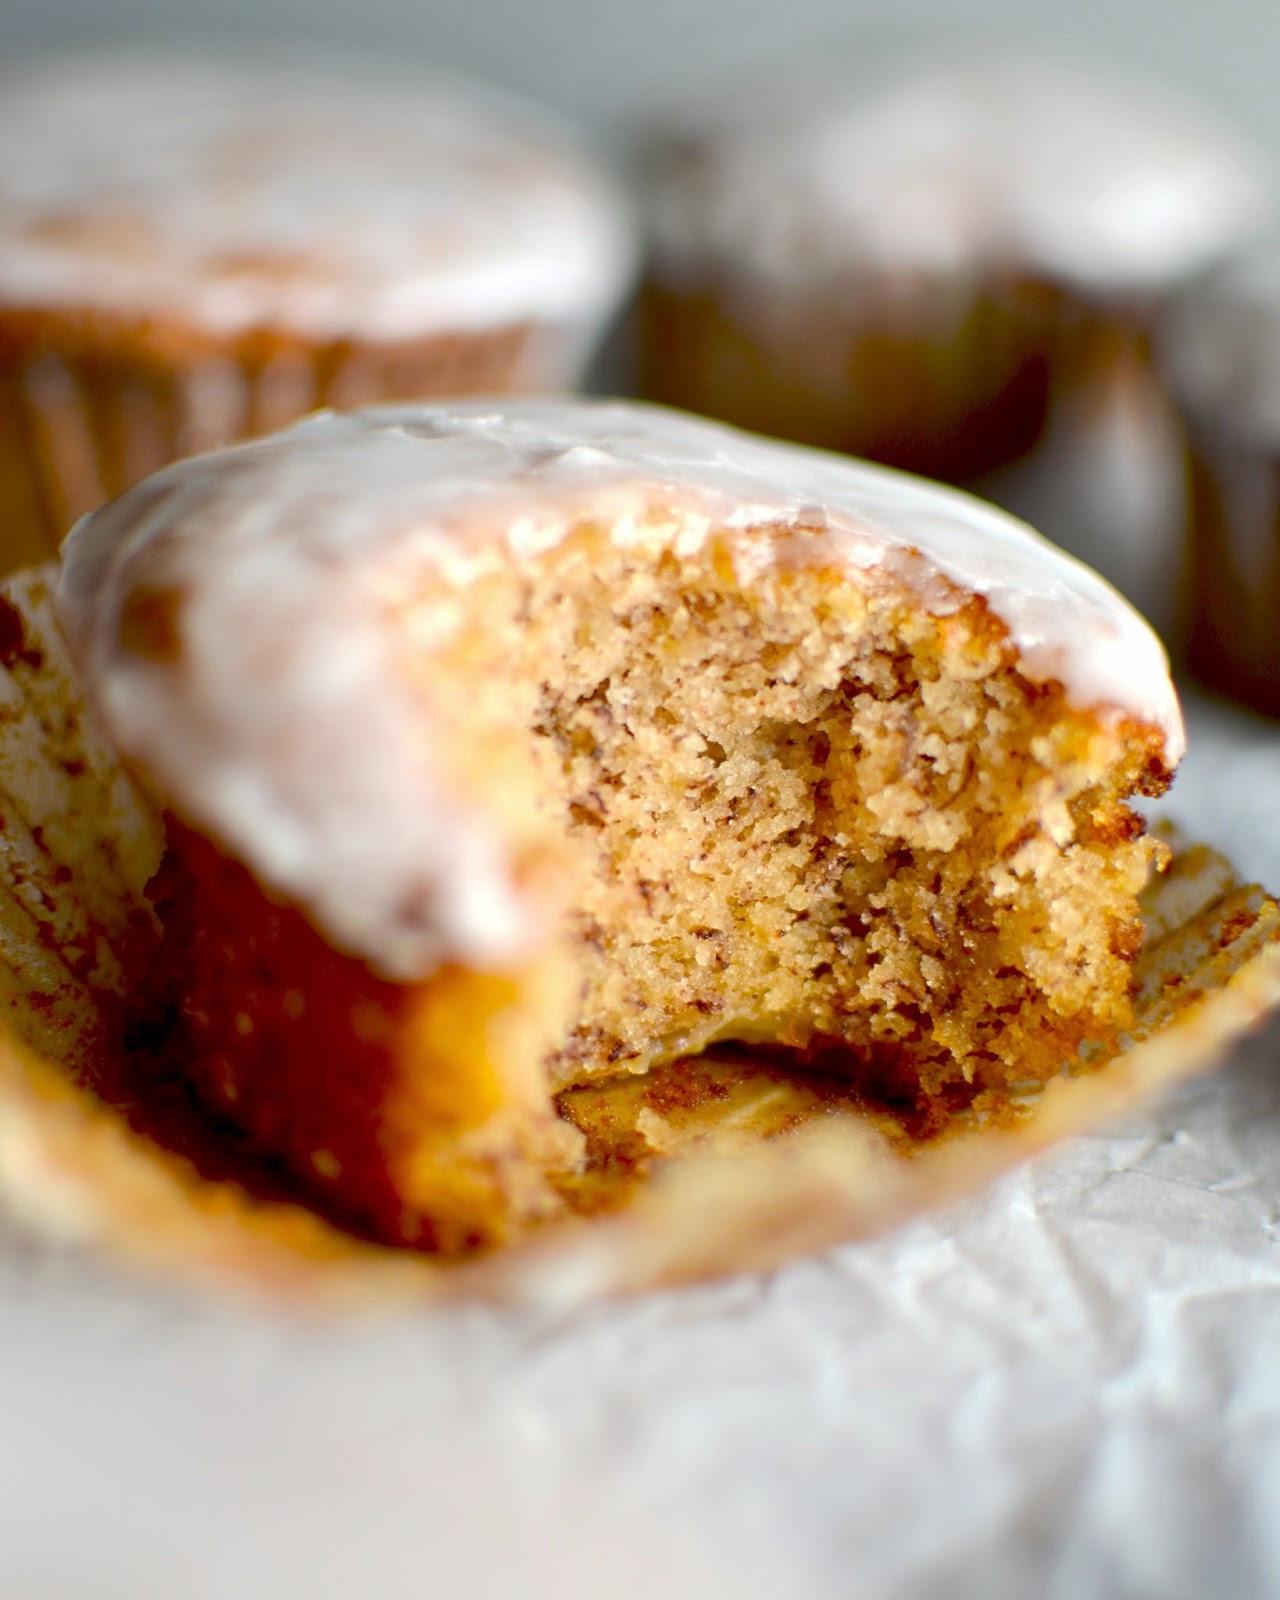 Best Banana Bread Muffins  Yammie s Noshery The Best Banana Bread Muffins Ever